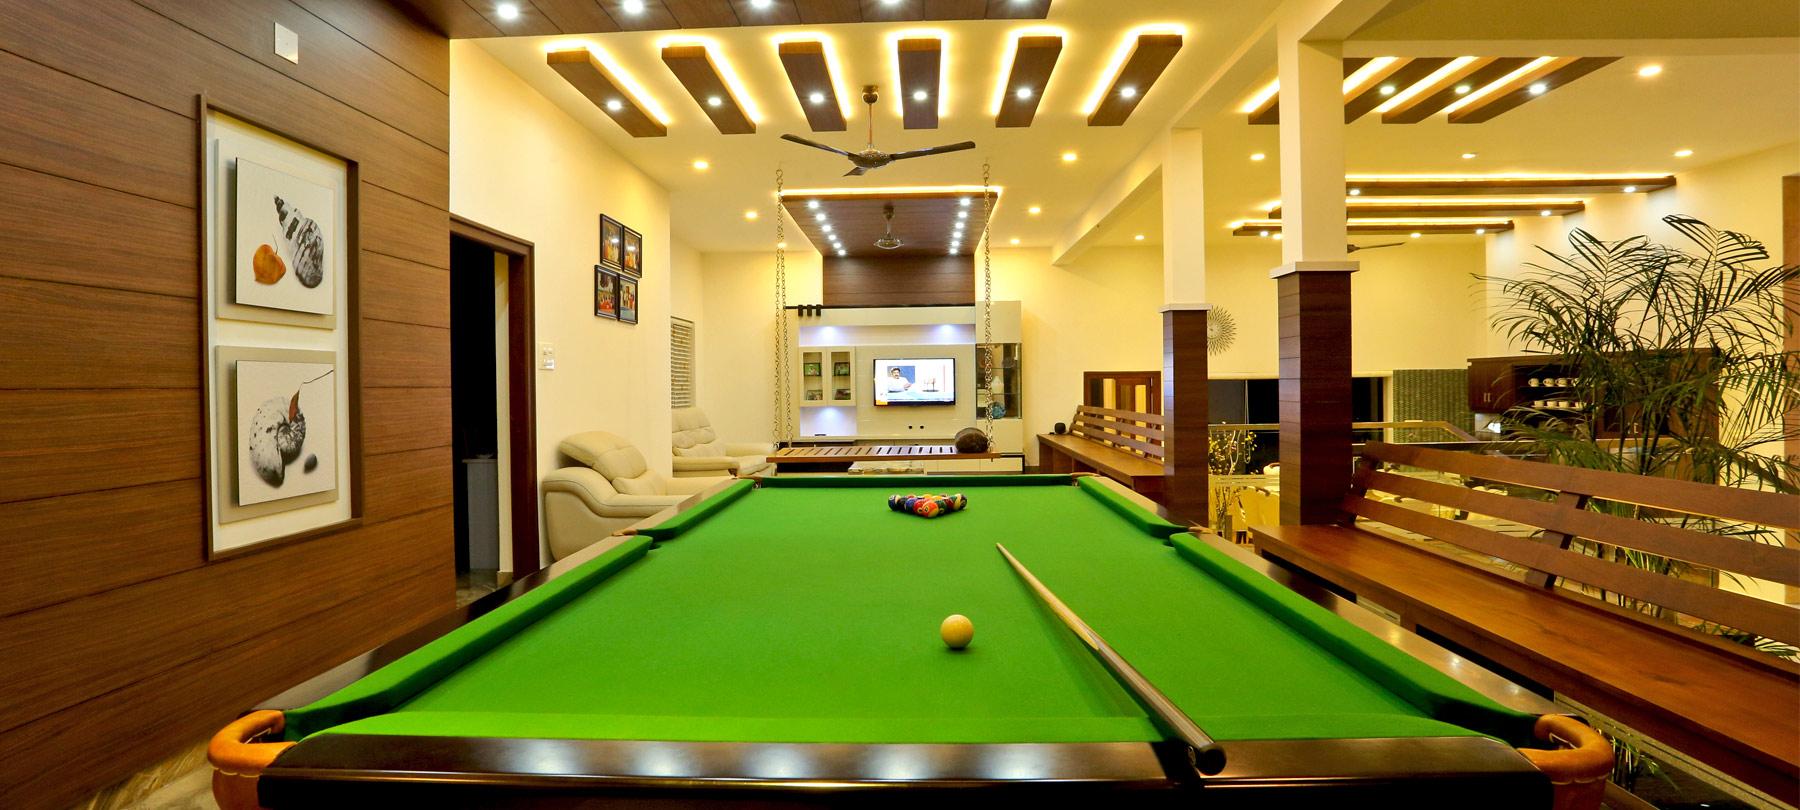 Interior Designers In Kochi Best Interior Design Company In Kerala Greentech Interiors